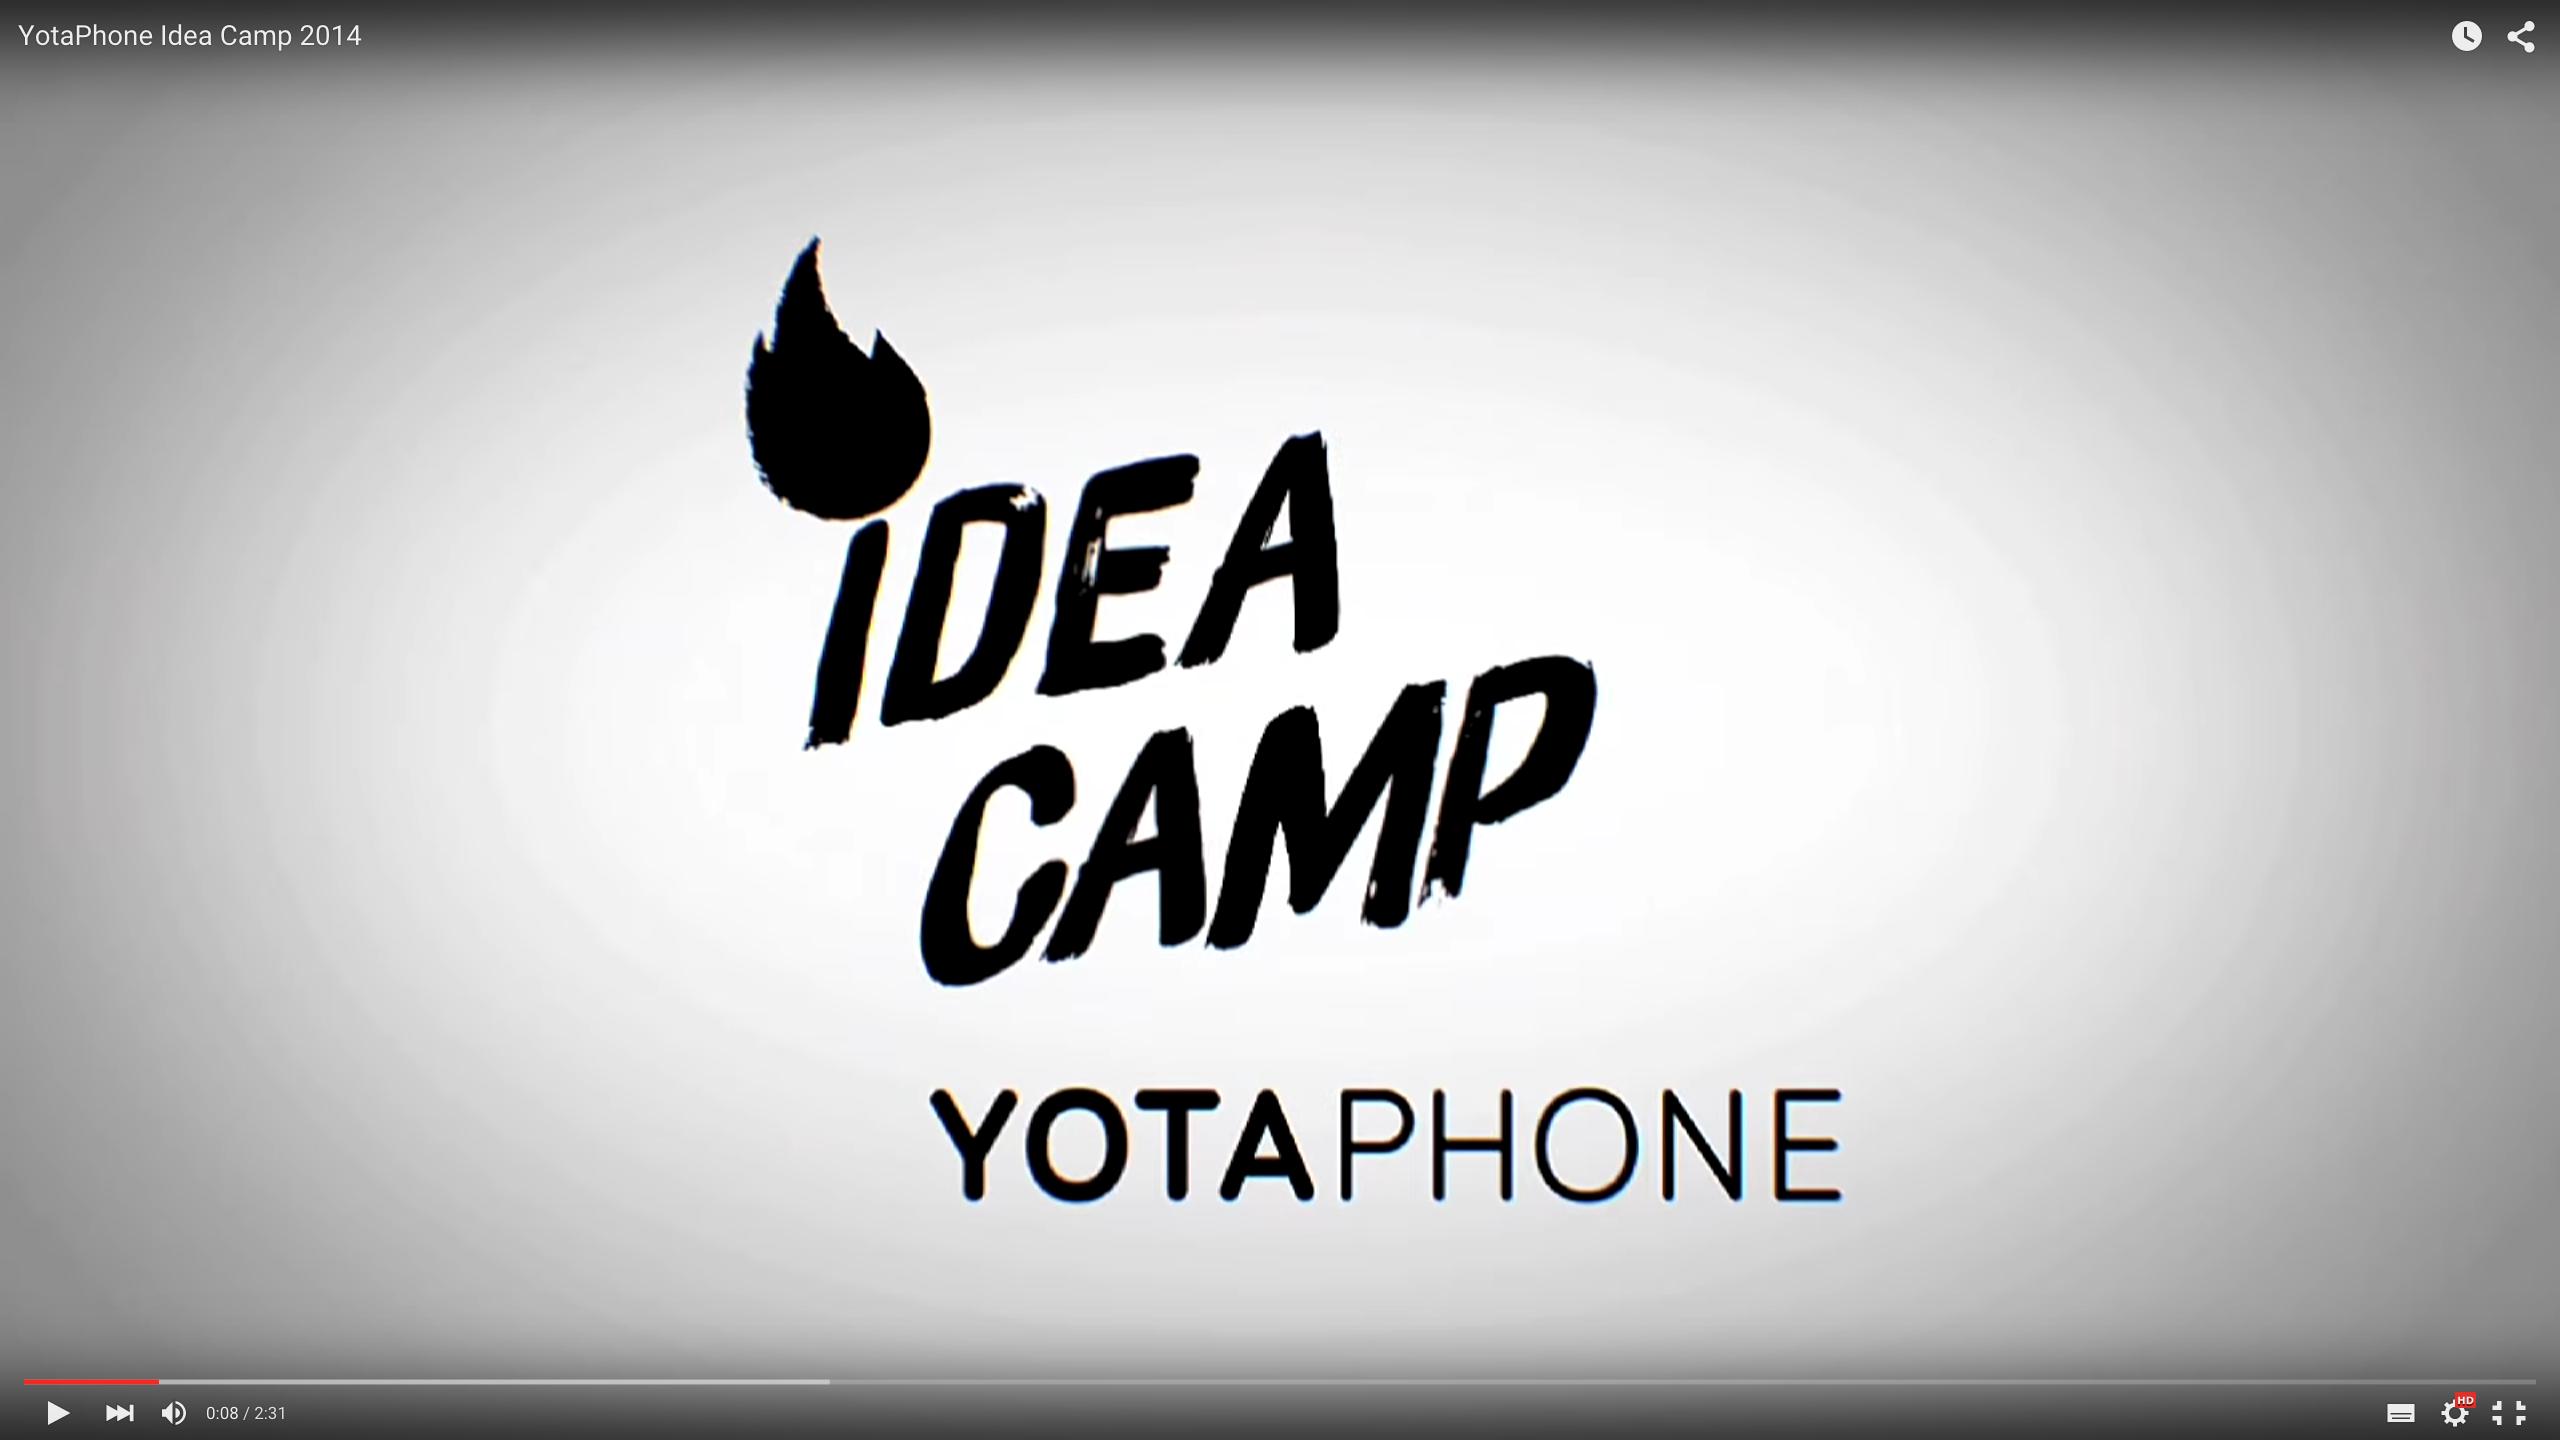 YotaPhone Idea Camp 2014